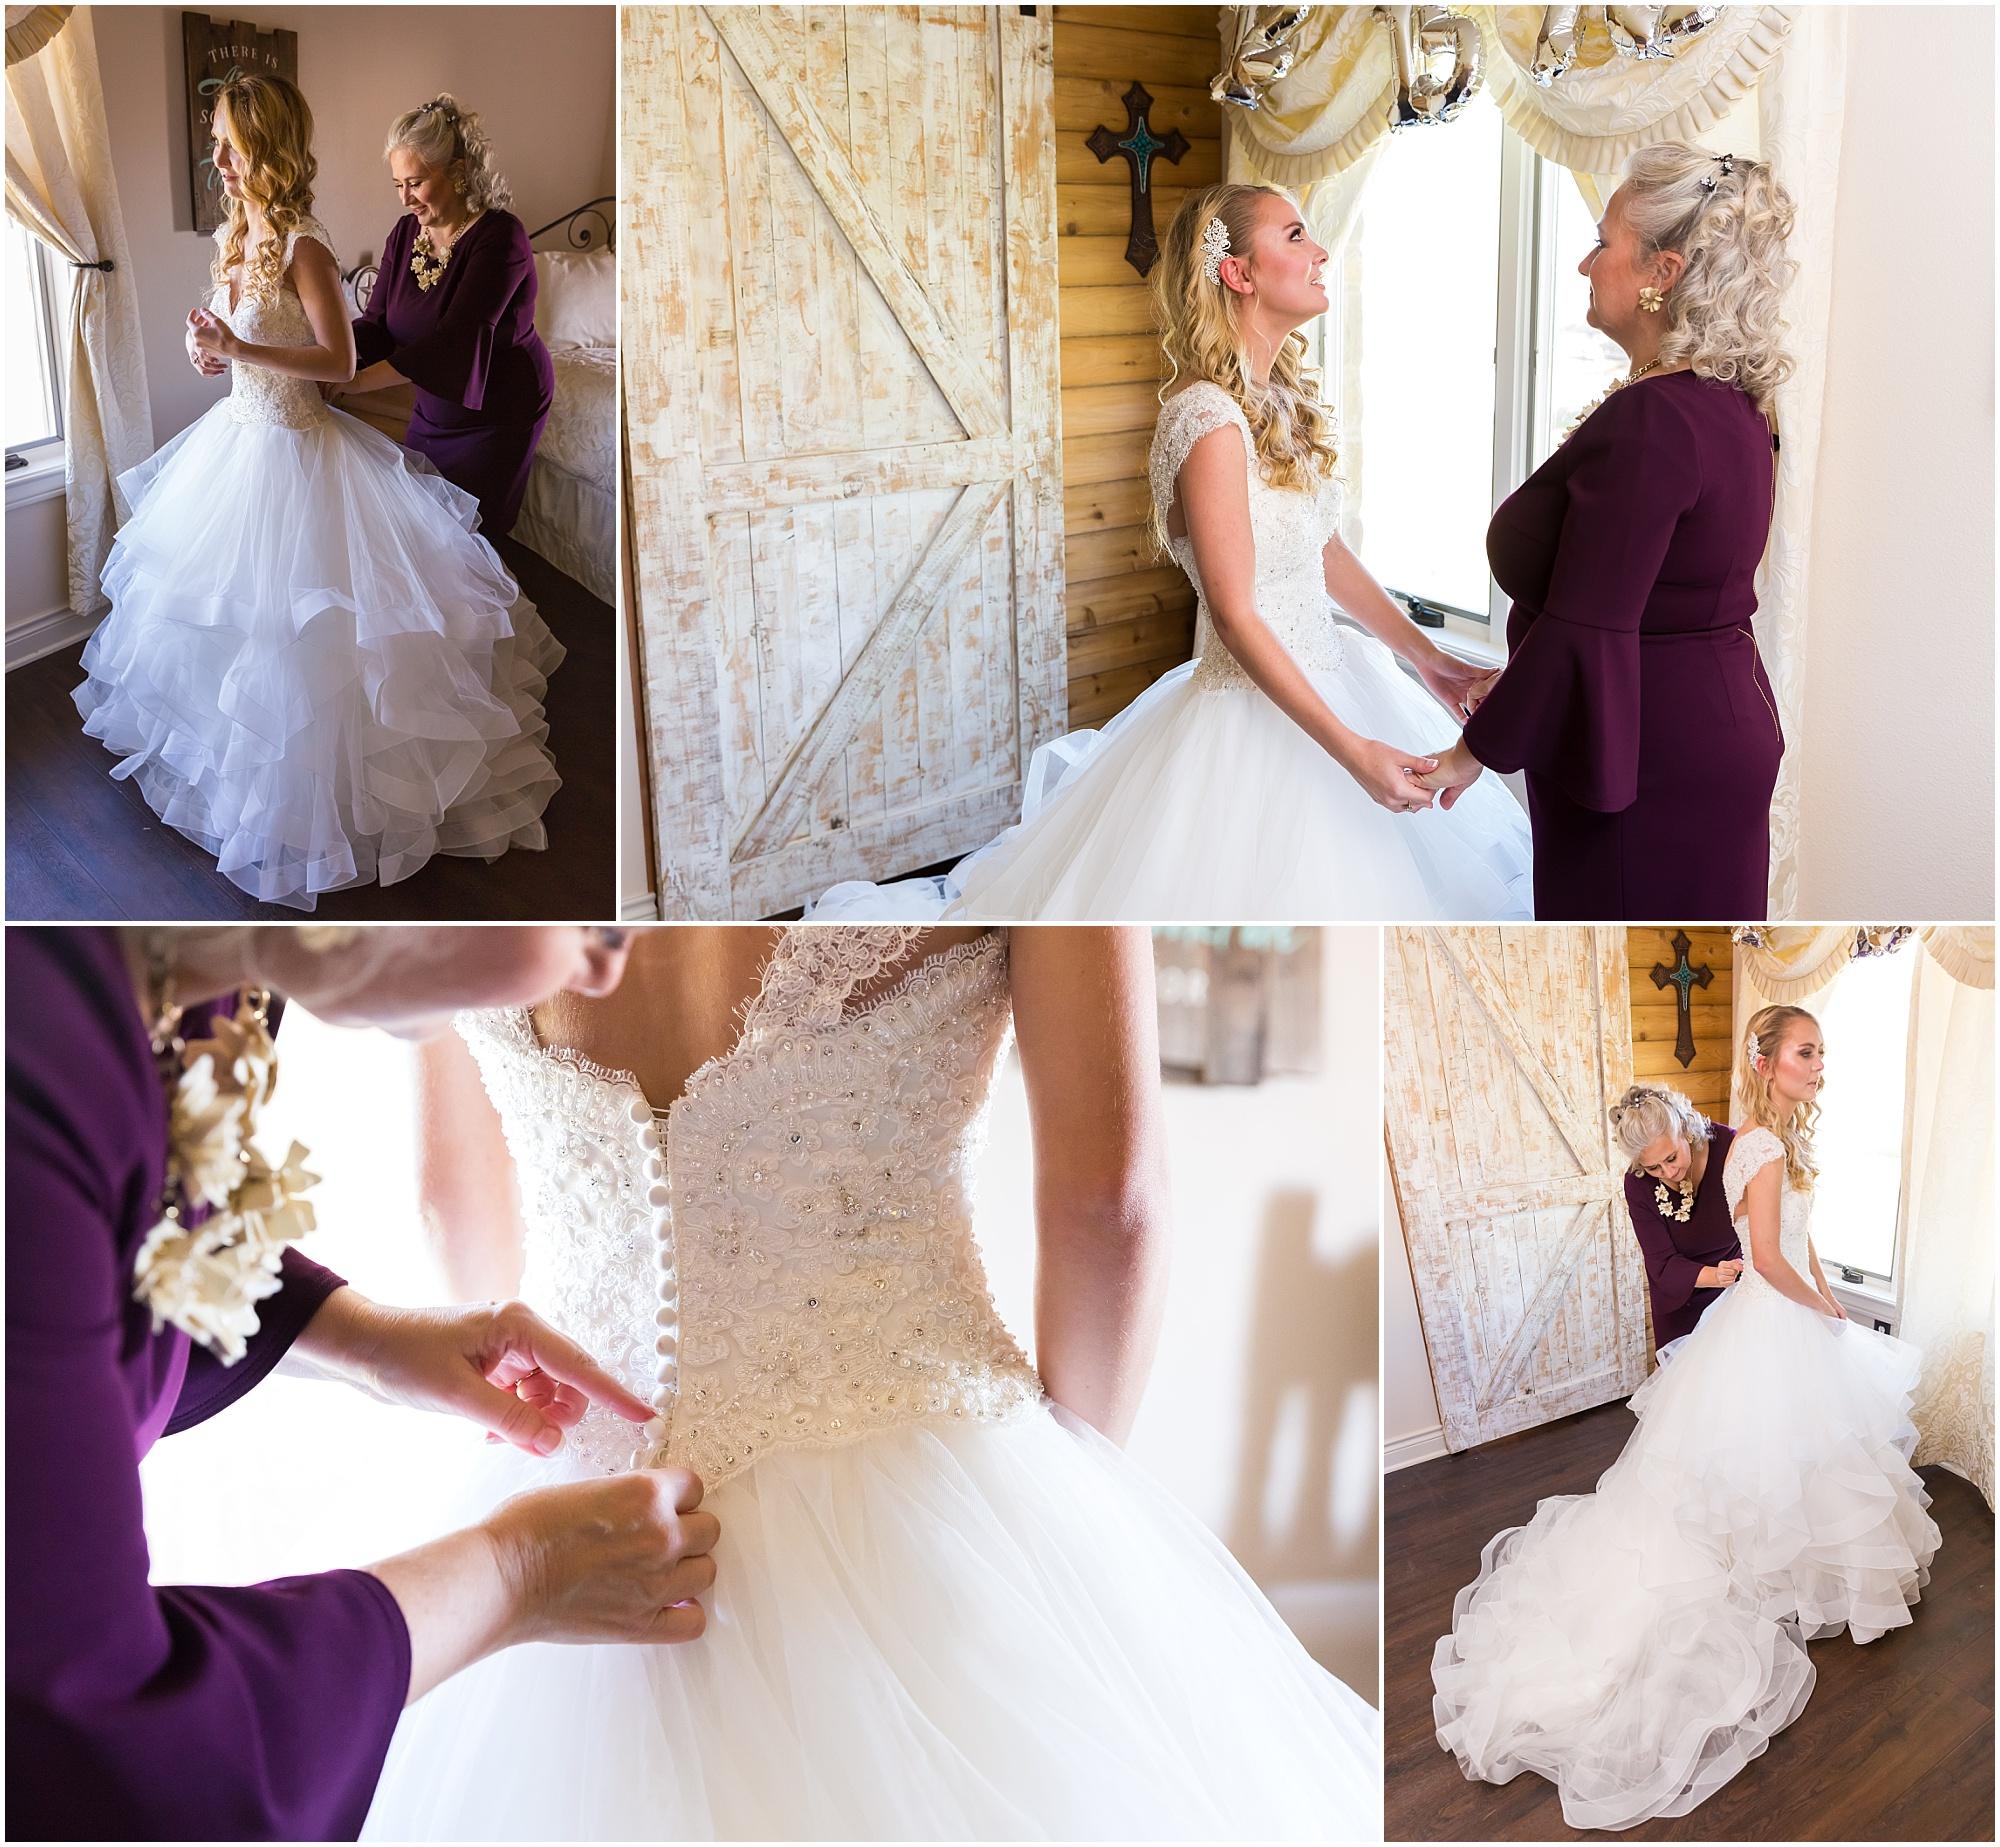 Disney-Inspired-Wedding-Central-Texas_0008.jpg